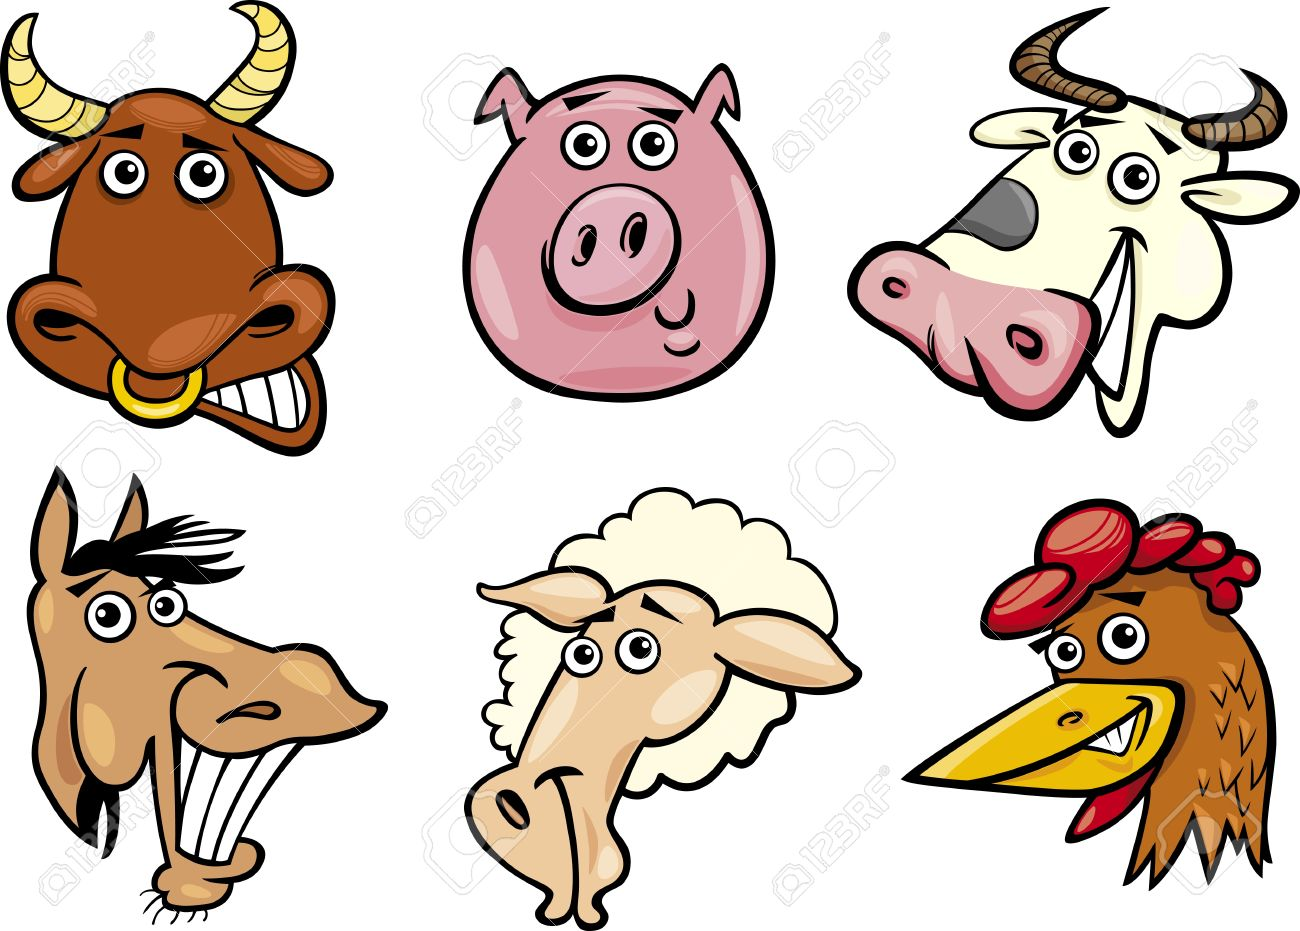 Funny Farm Animals Clipart-Funny Farm Animals Clipart-16